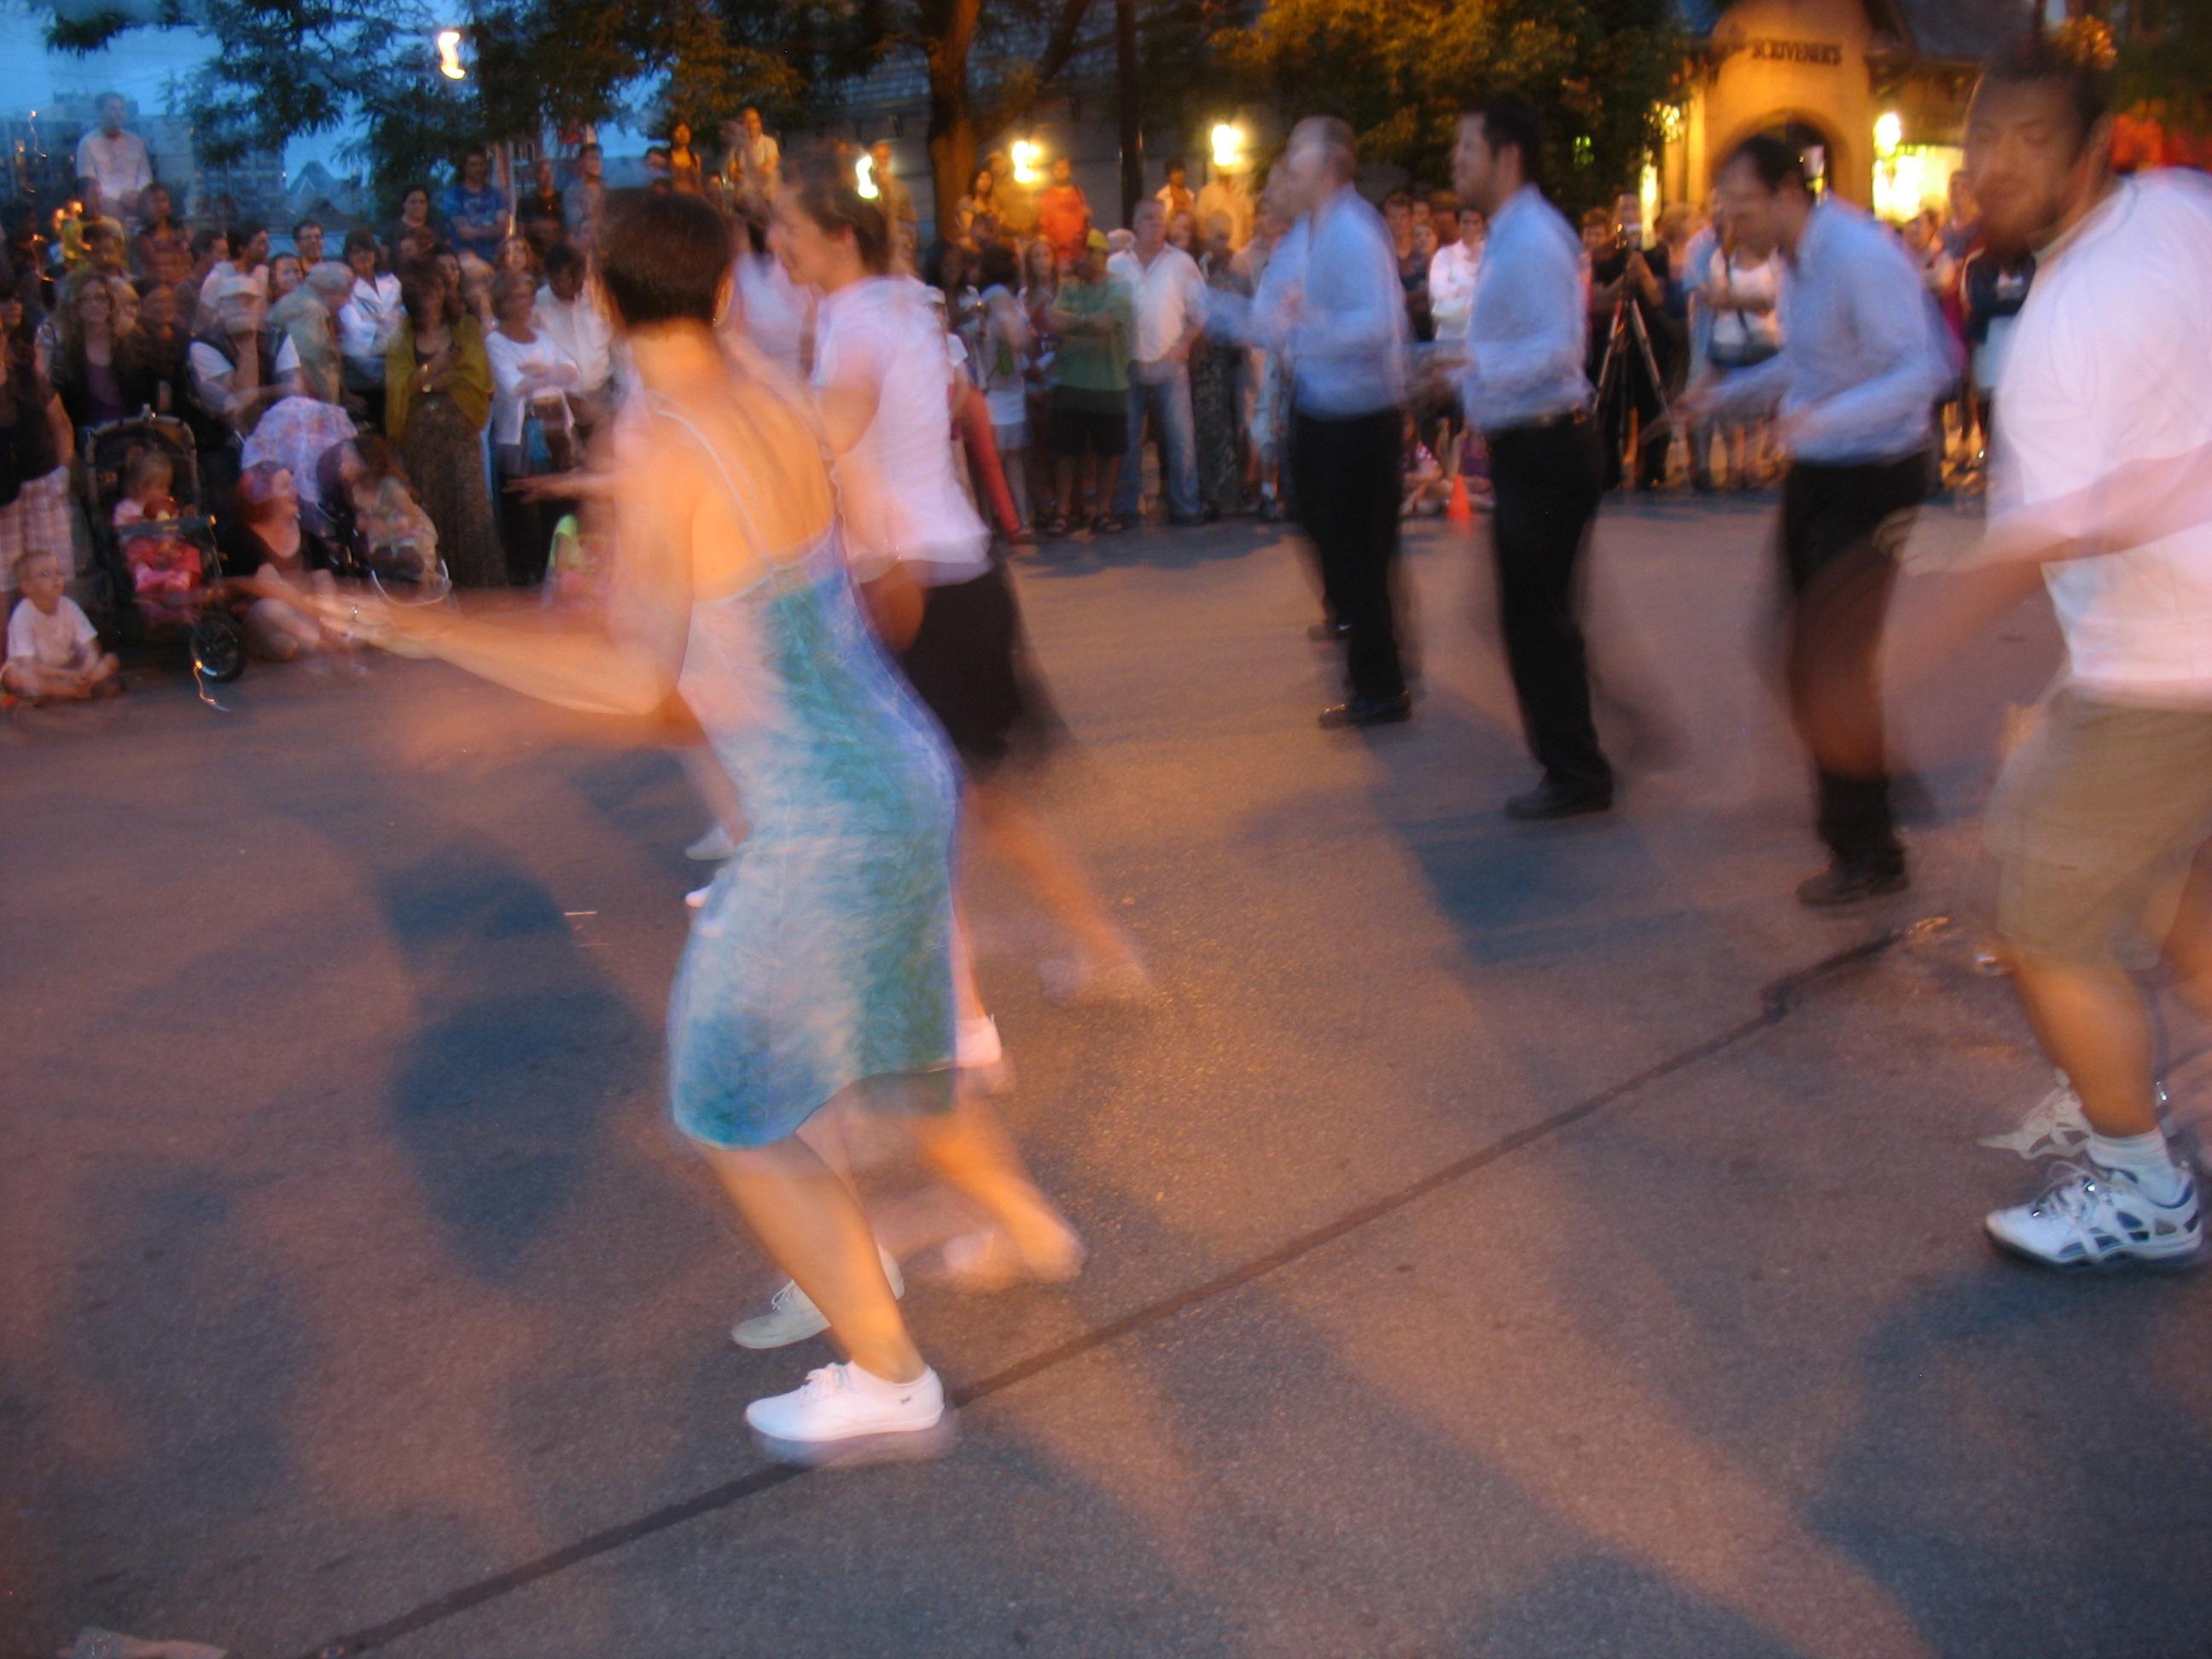 danceScape @ Burlington Sound of Music Festival, Part II – June 16th HIGHLIGHTS (SATURDAY)